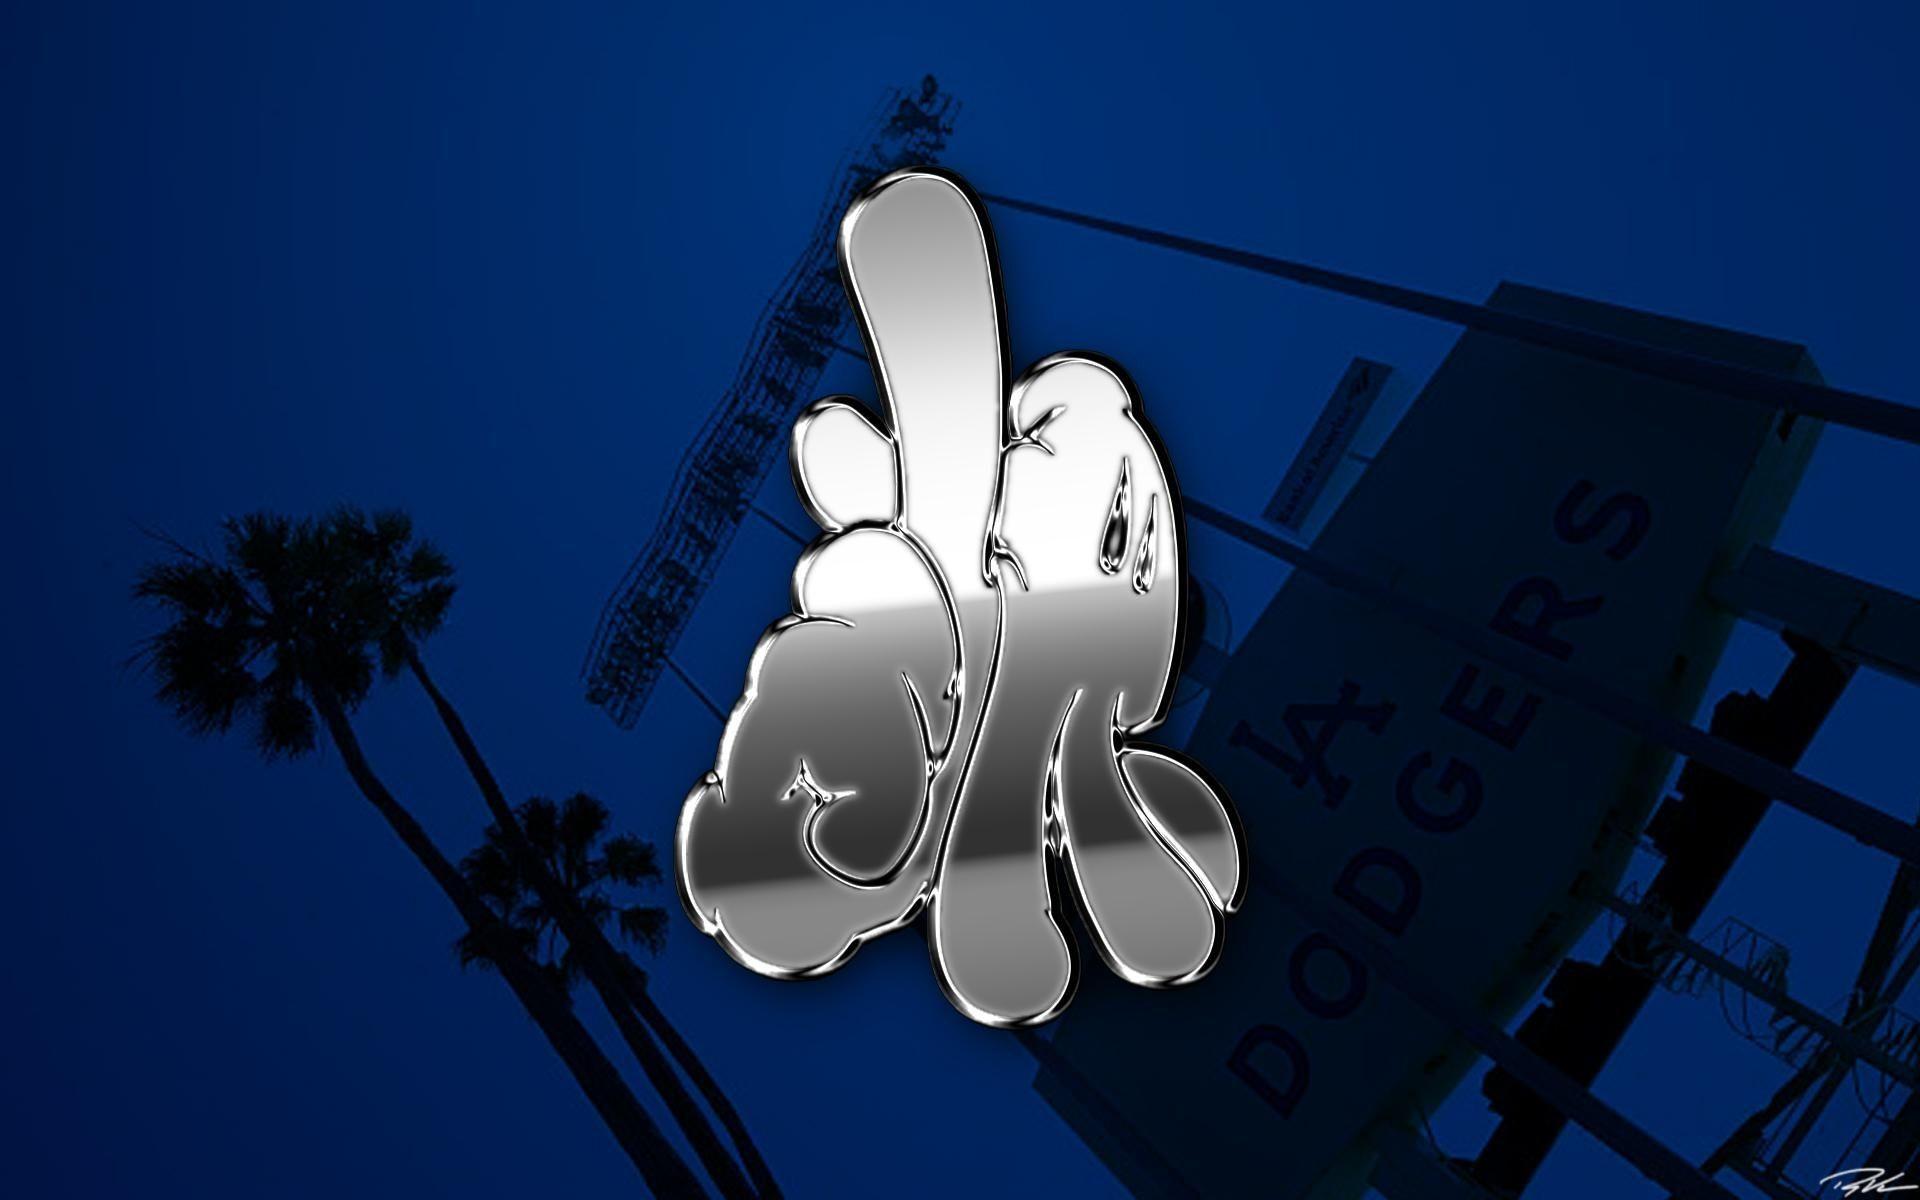 LOS ANGELES DODGERS WALLPAPER – (#135983) – HD Wallpapers .